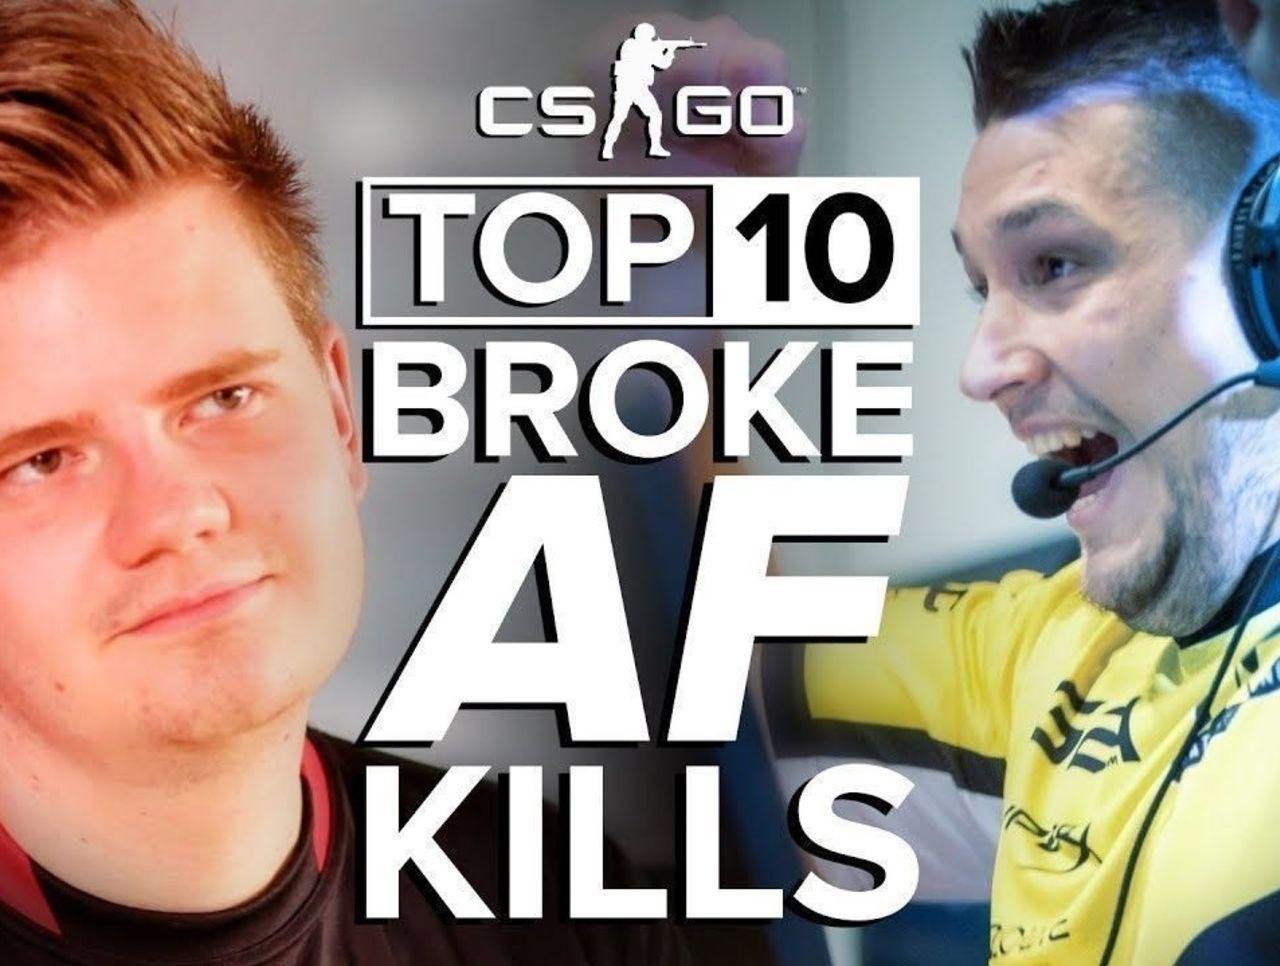 Top 10 Broke AF Kills in CS:GO (Eco Round Aces)